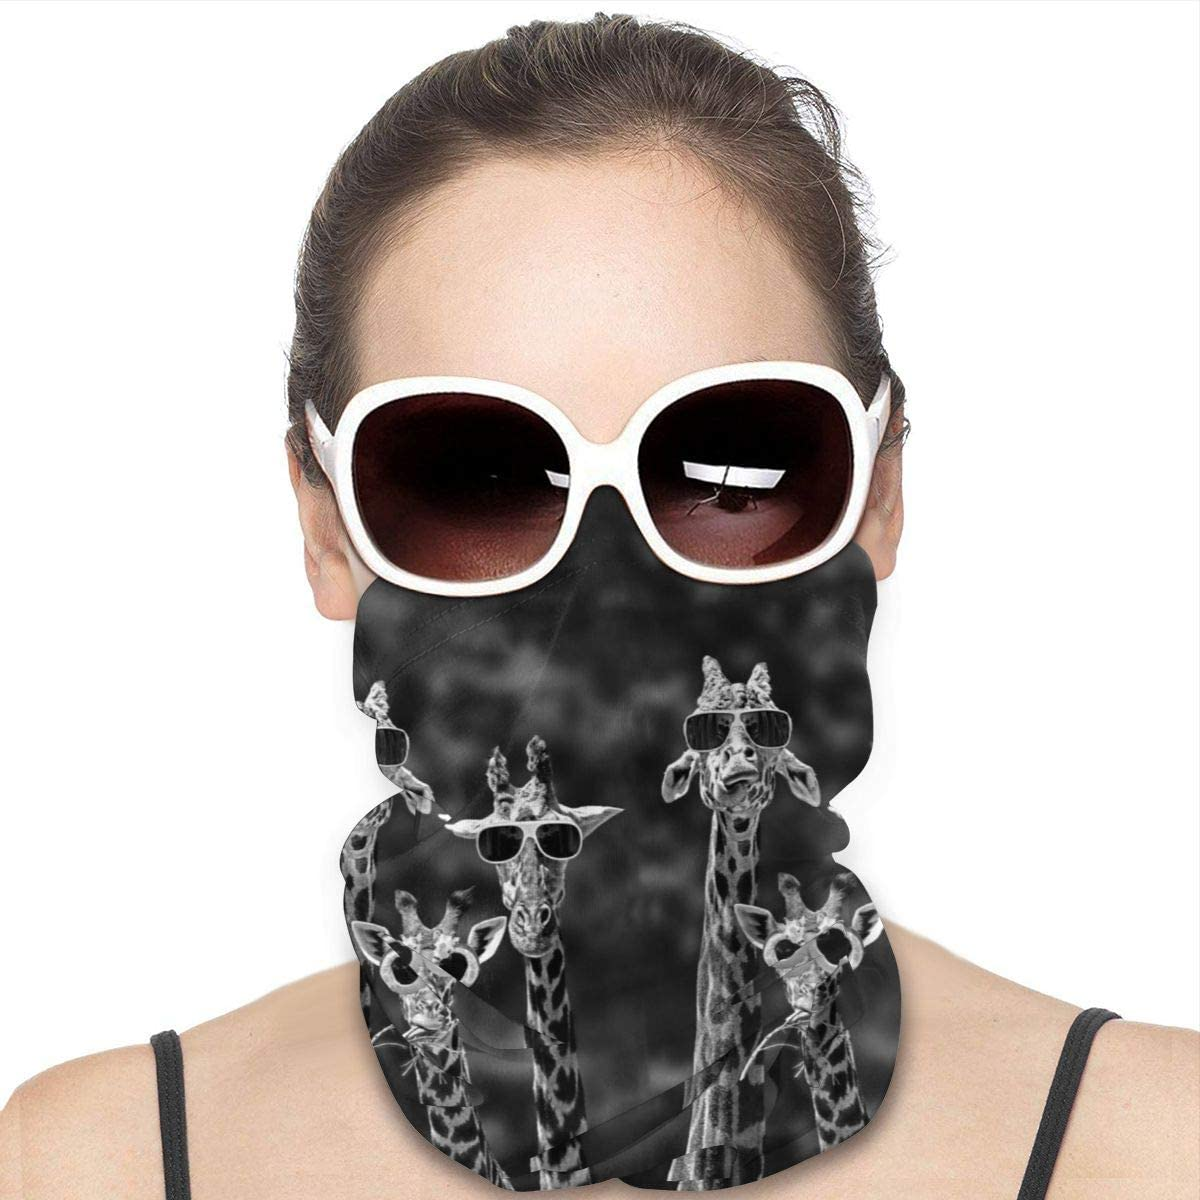 JinSPef Motorcycle Masks for Men - All Seeing Eye Indian Fatima Hamsa Hand Motorcycle Mask Neck Gaiter Neck Gaiter Head Bands Neck Gaiters for Men Headscarf Face Mask Bandana